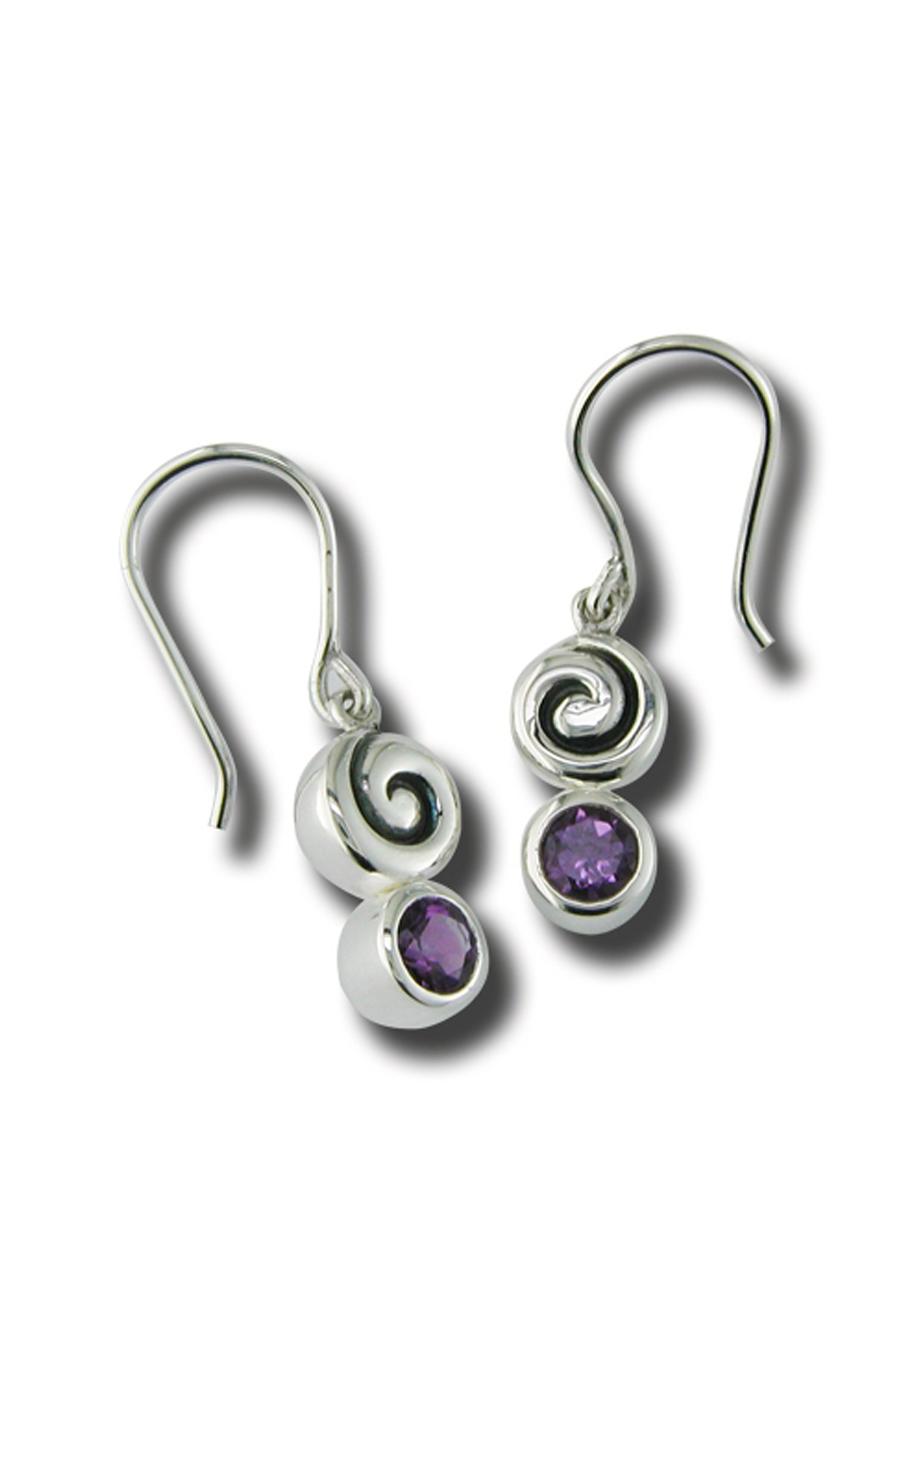 Zina Swirl Earrings B733-A product image